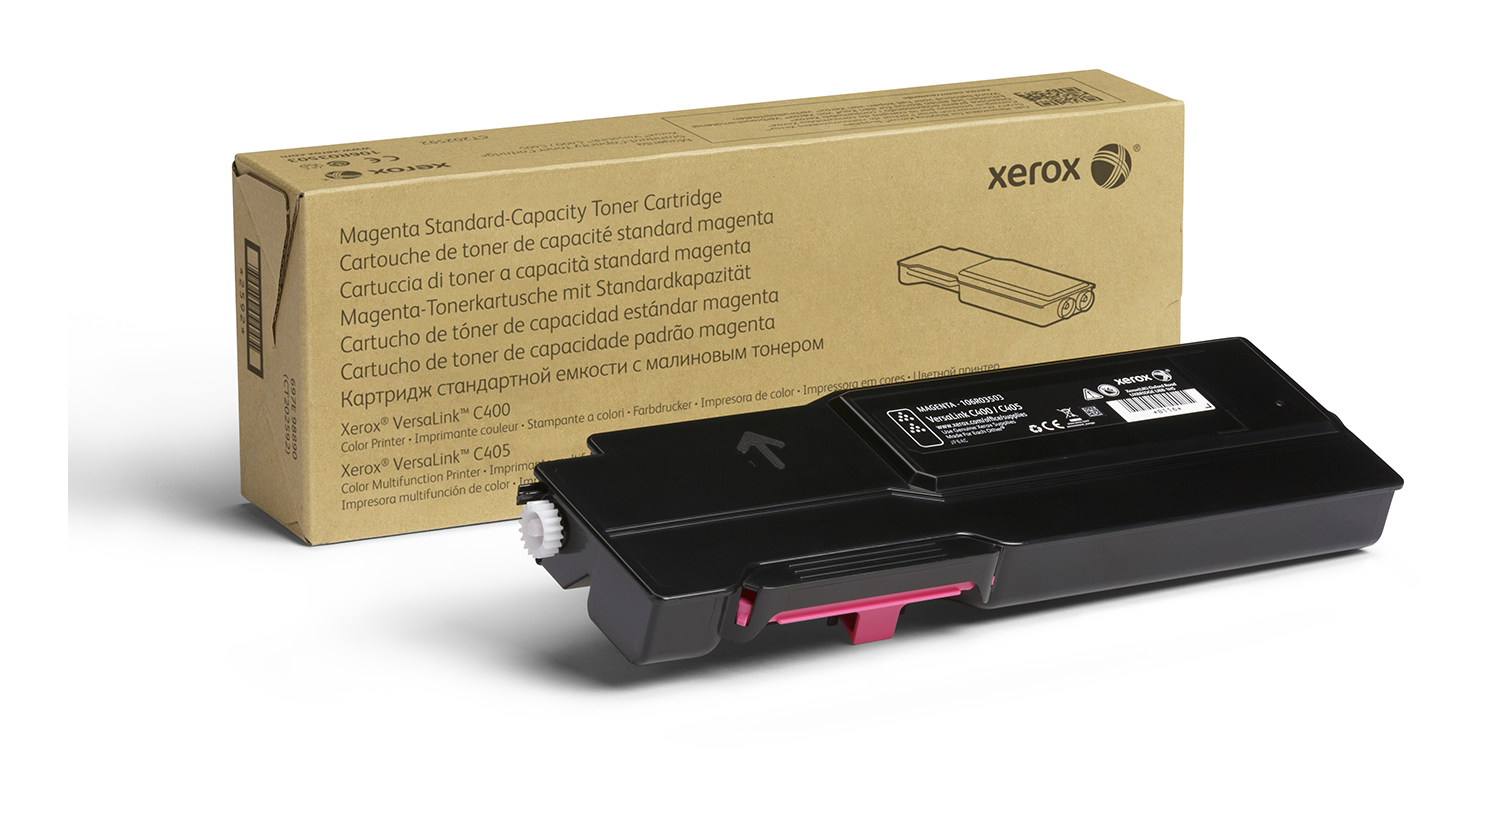 106R03503 | Original Xerox Toner Cartridge - Magenta